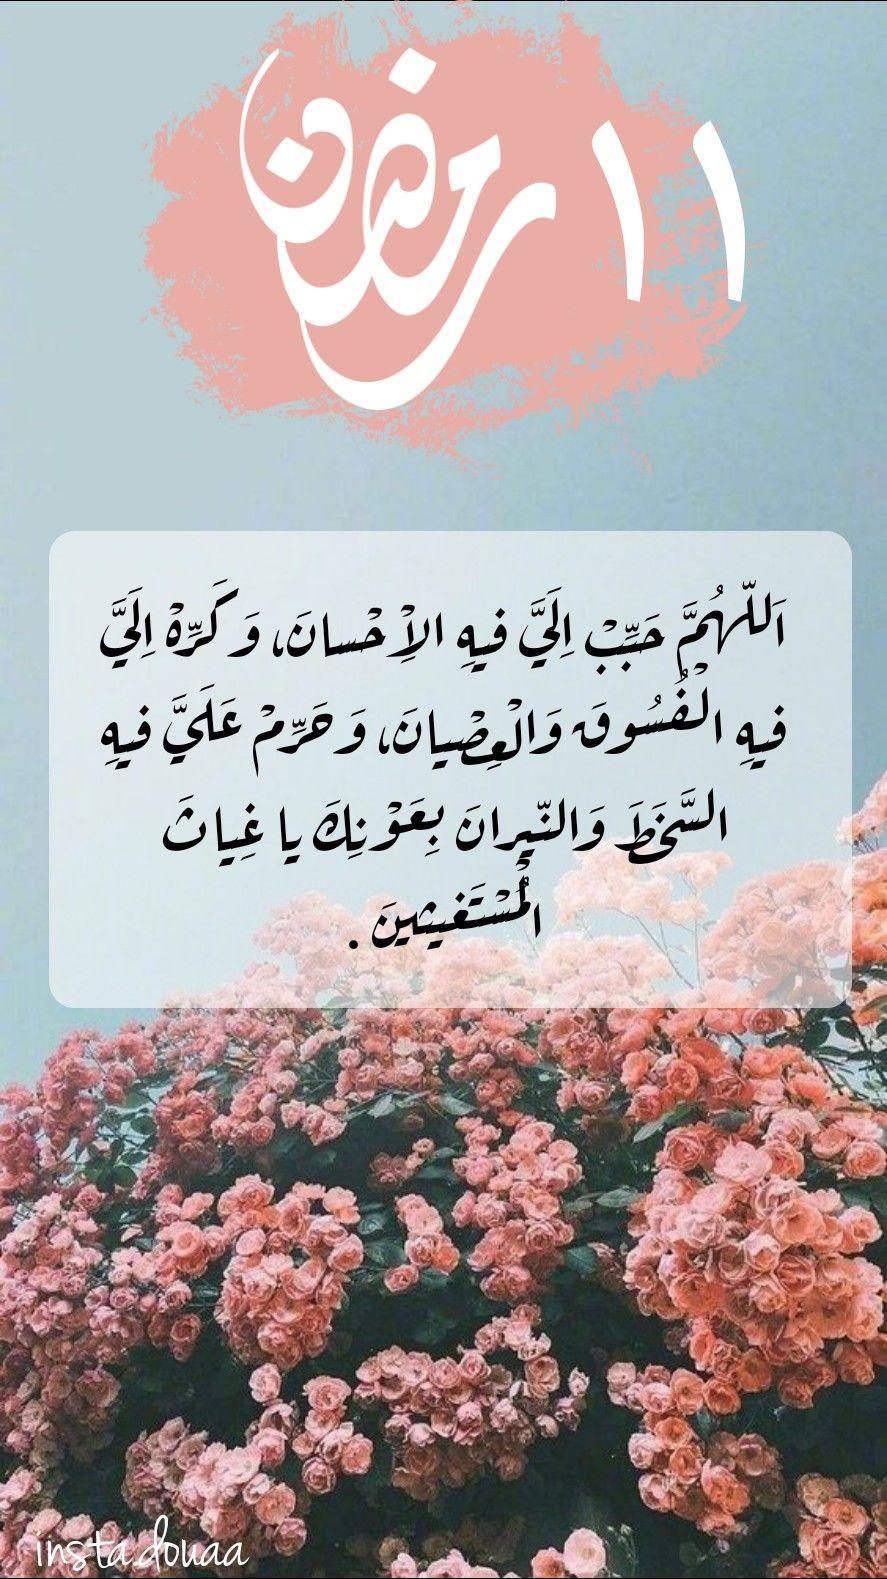 ١١ رمضان Islamic Quotes Quran Beautiful Arabic Words Ramadan Kareem